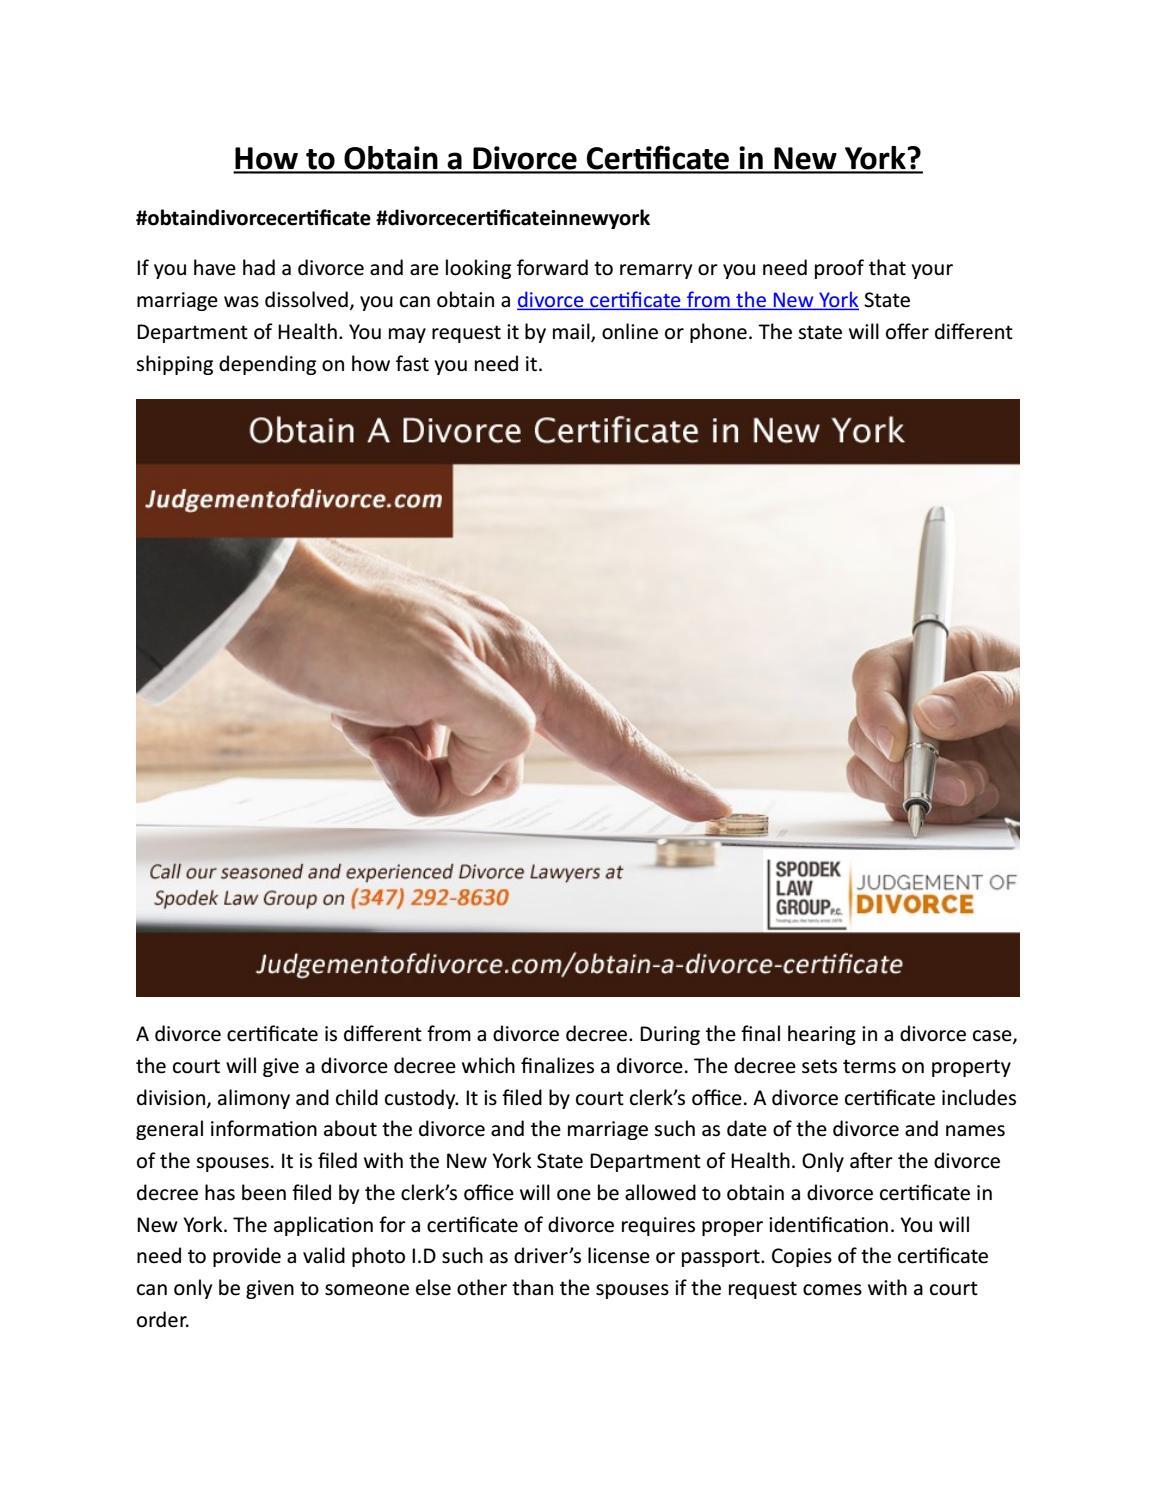 Obtain A Divorce Certificate Judgement Of Divorce By Divorce